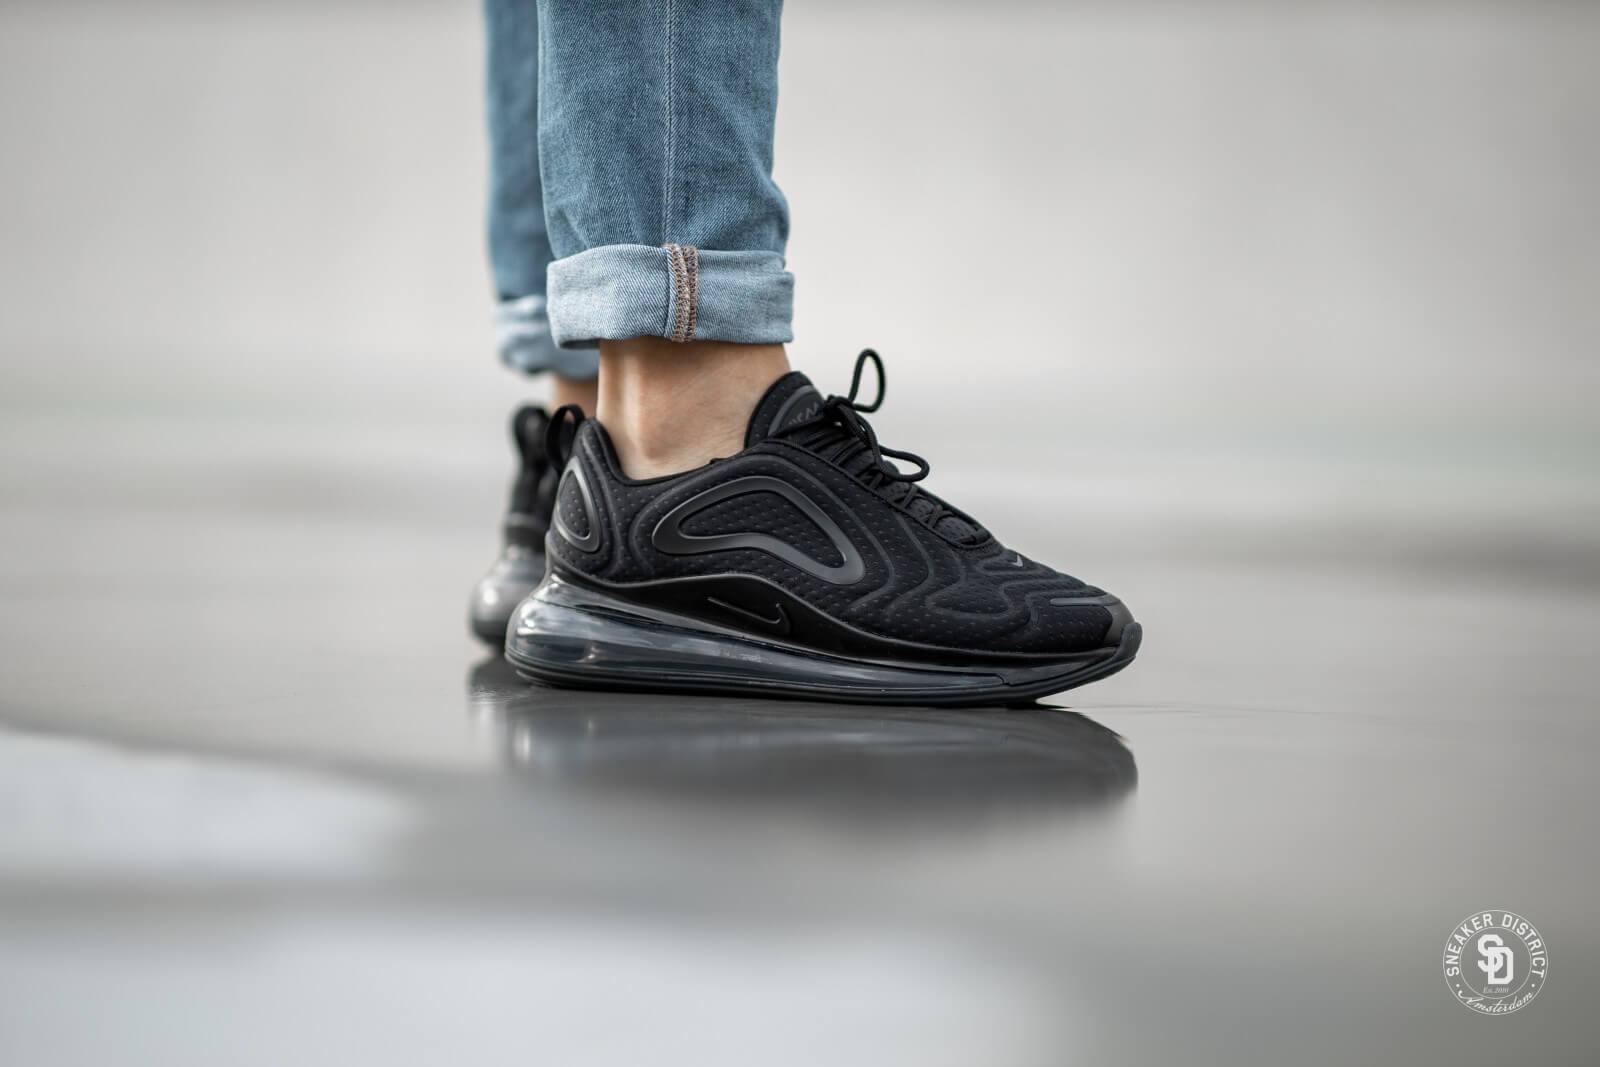 Nike Air Max 720 Black/Black - AO2924-015